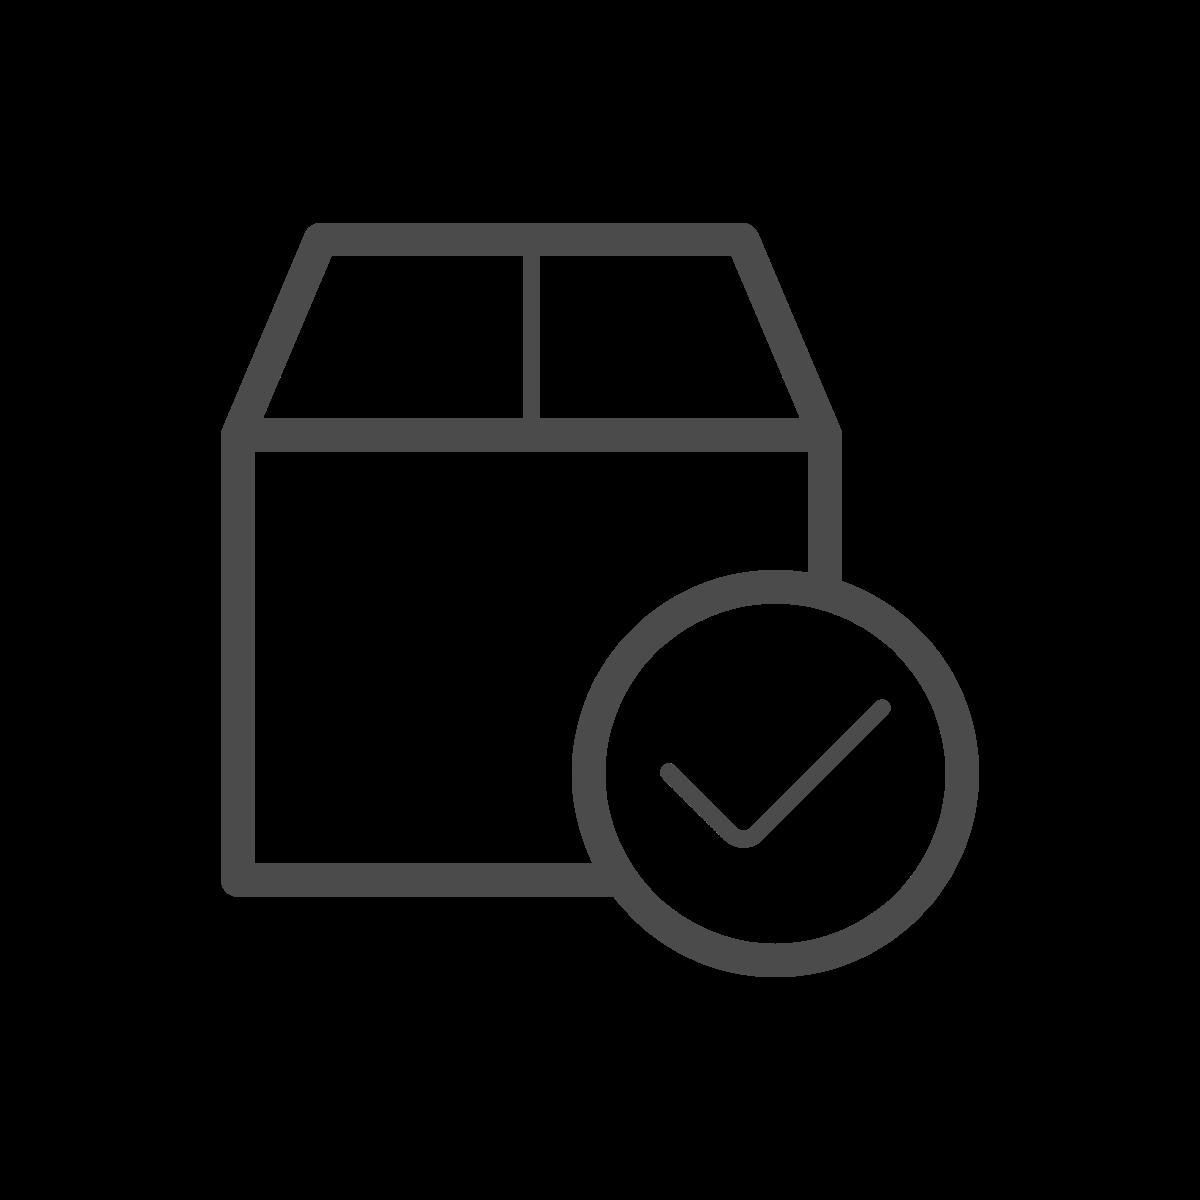 minimal successful shipment icon